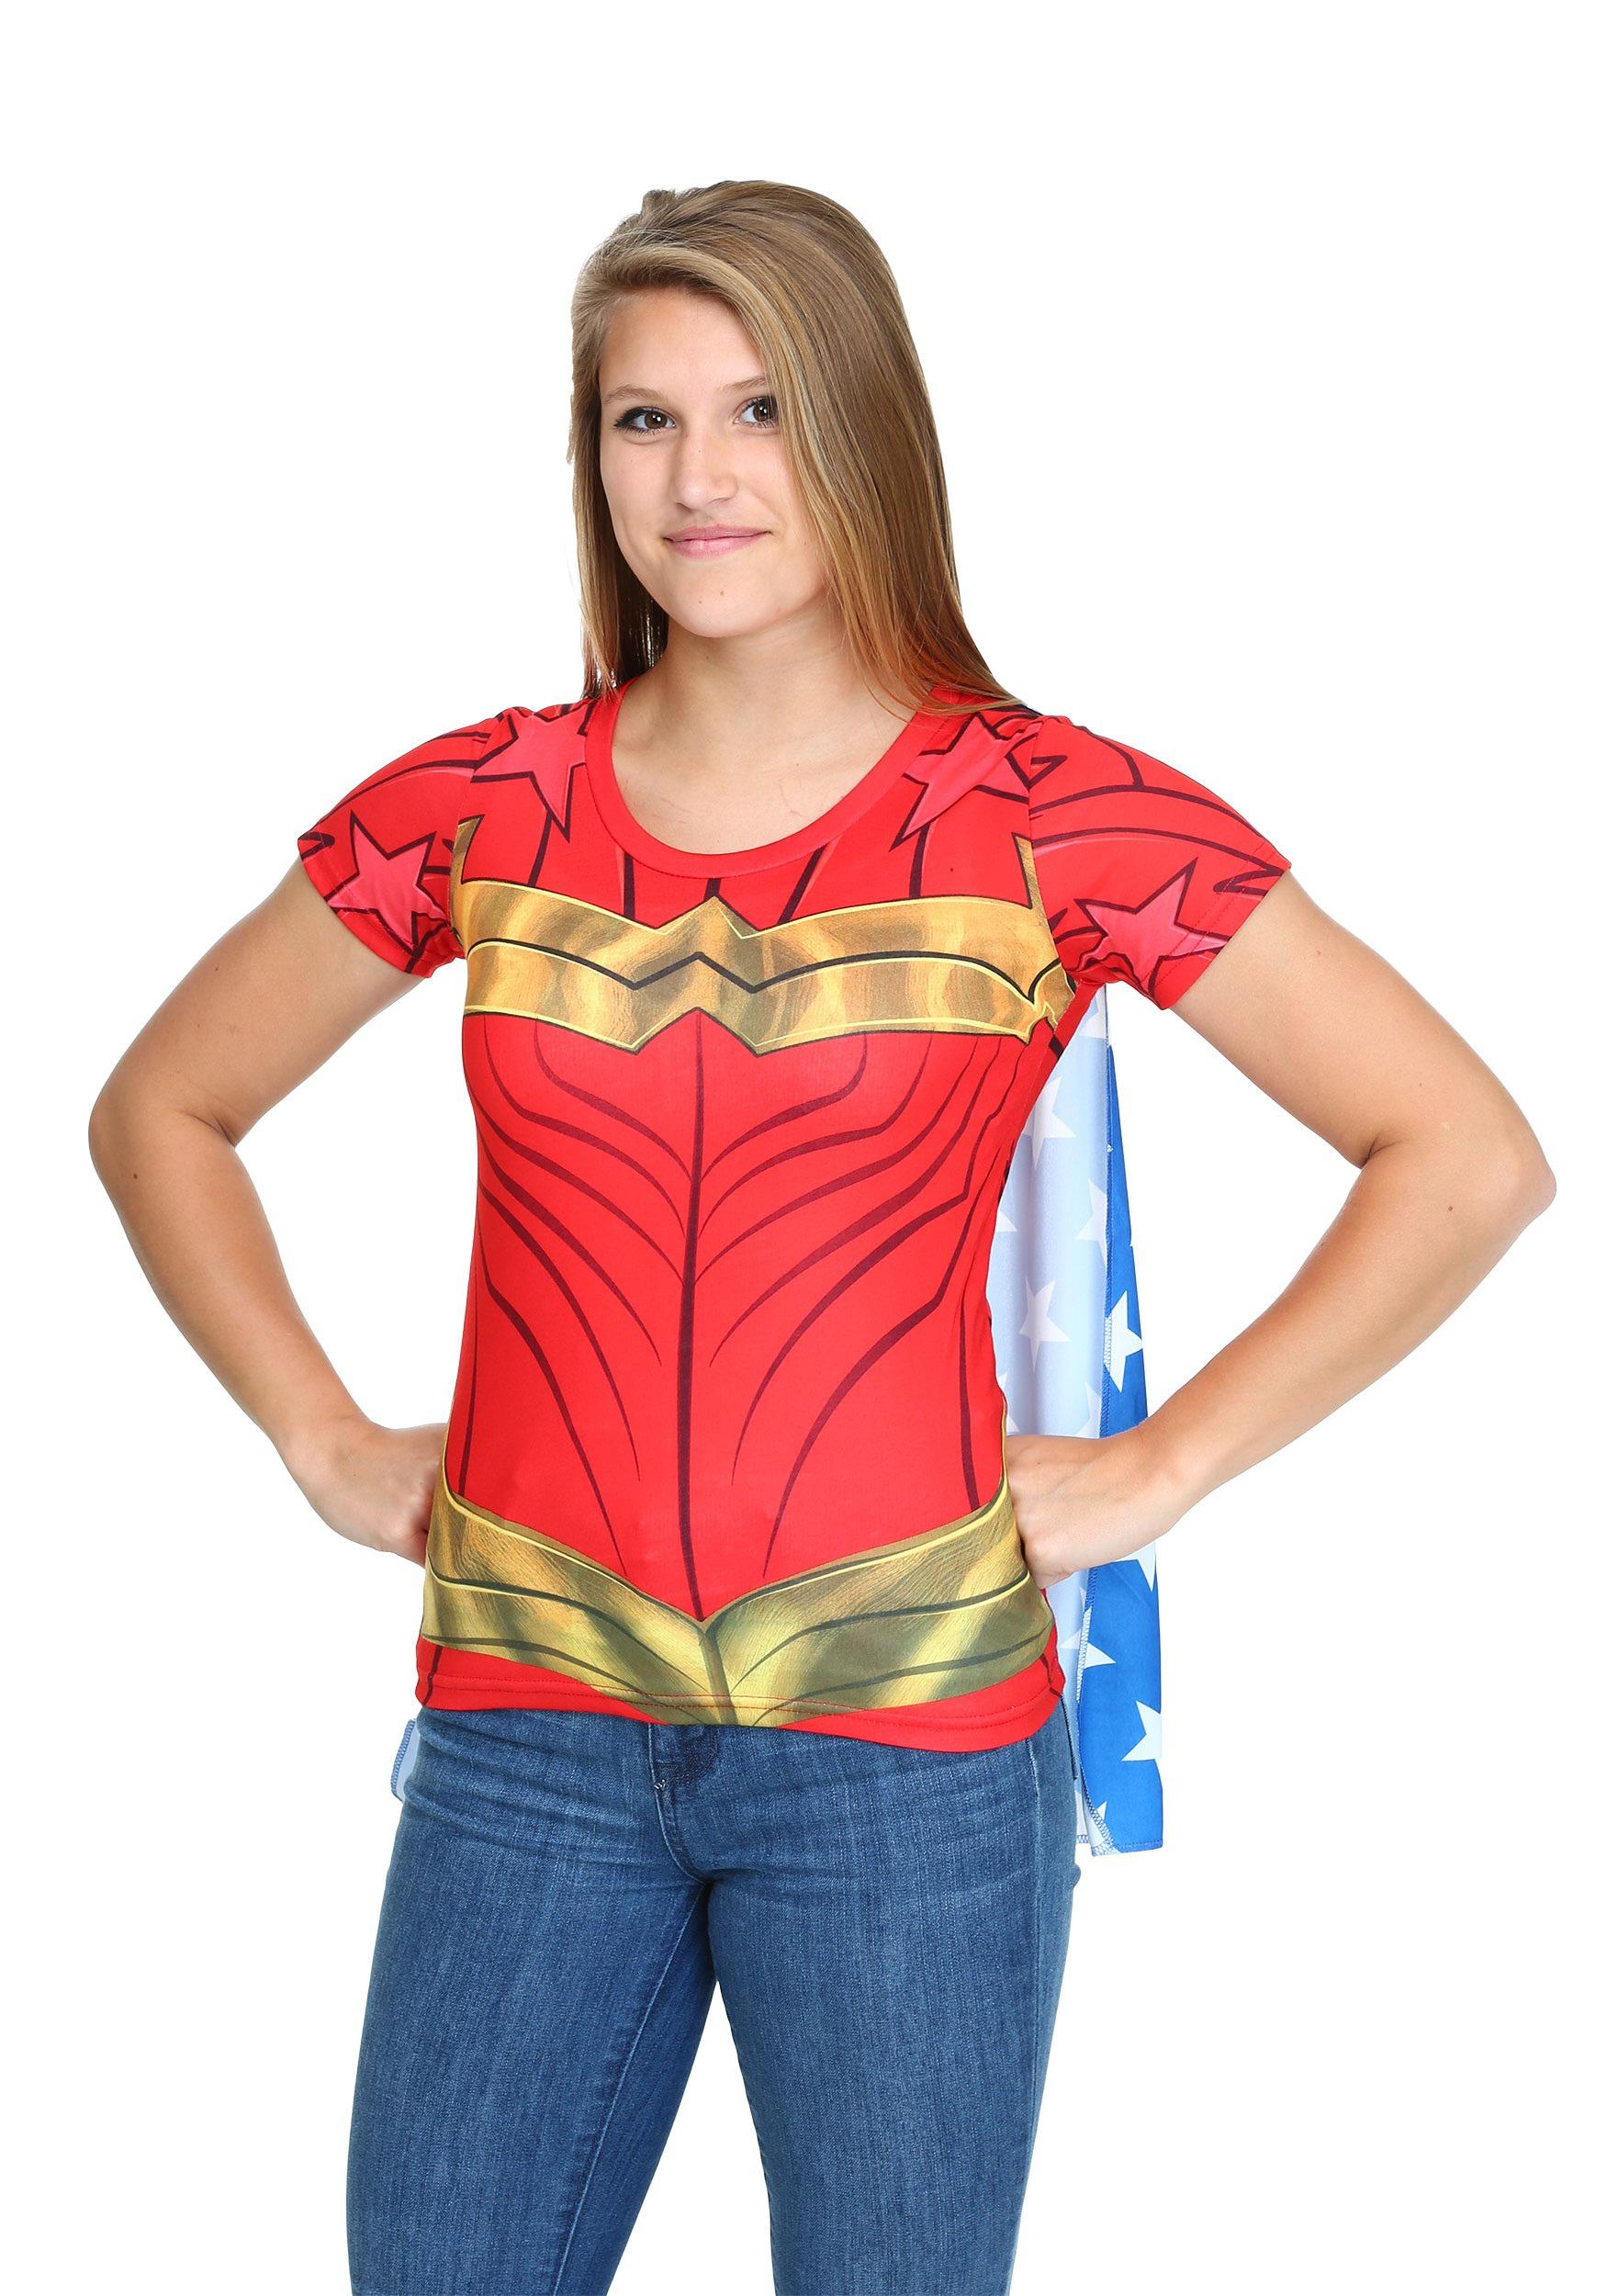 wonder woman costumes - halloweencostumes